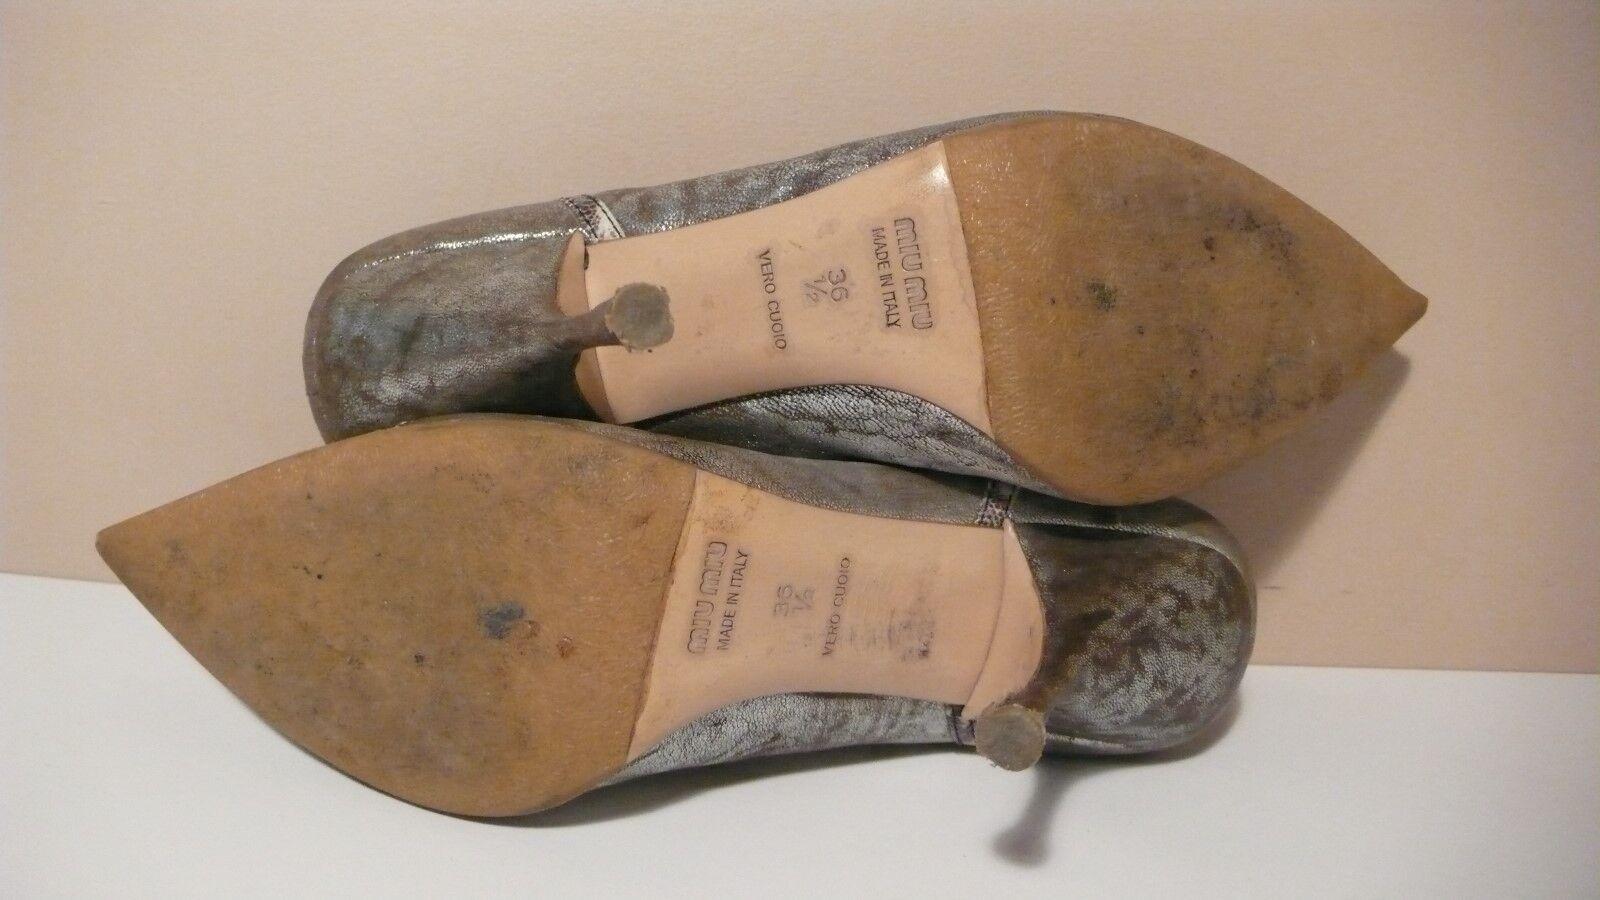 MIU MIU Women's Pointy Toe Distressed Leather Leather Leather Heels Pumps Sz 36.5  3e4895